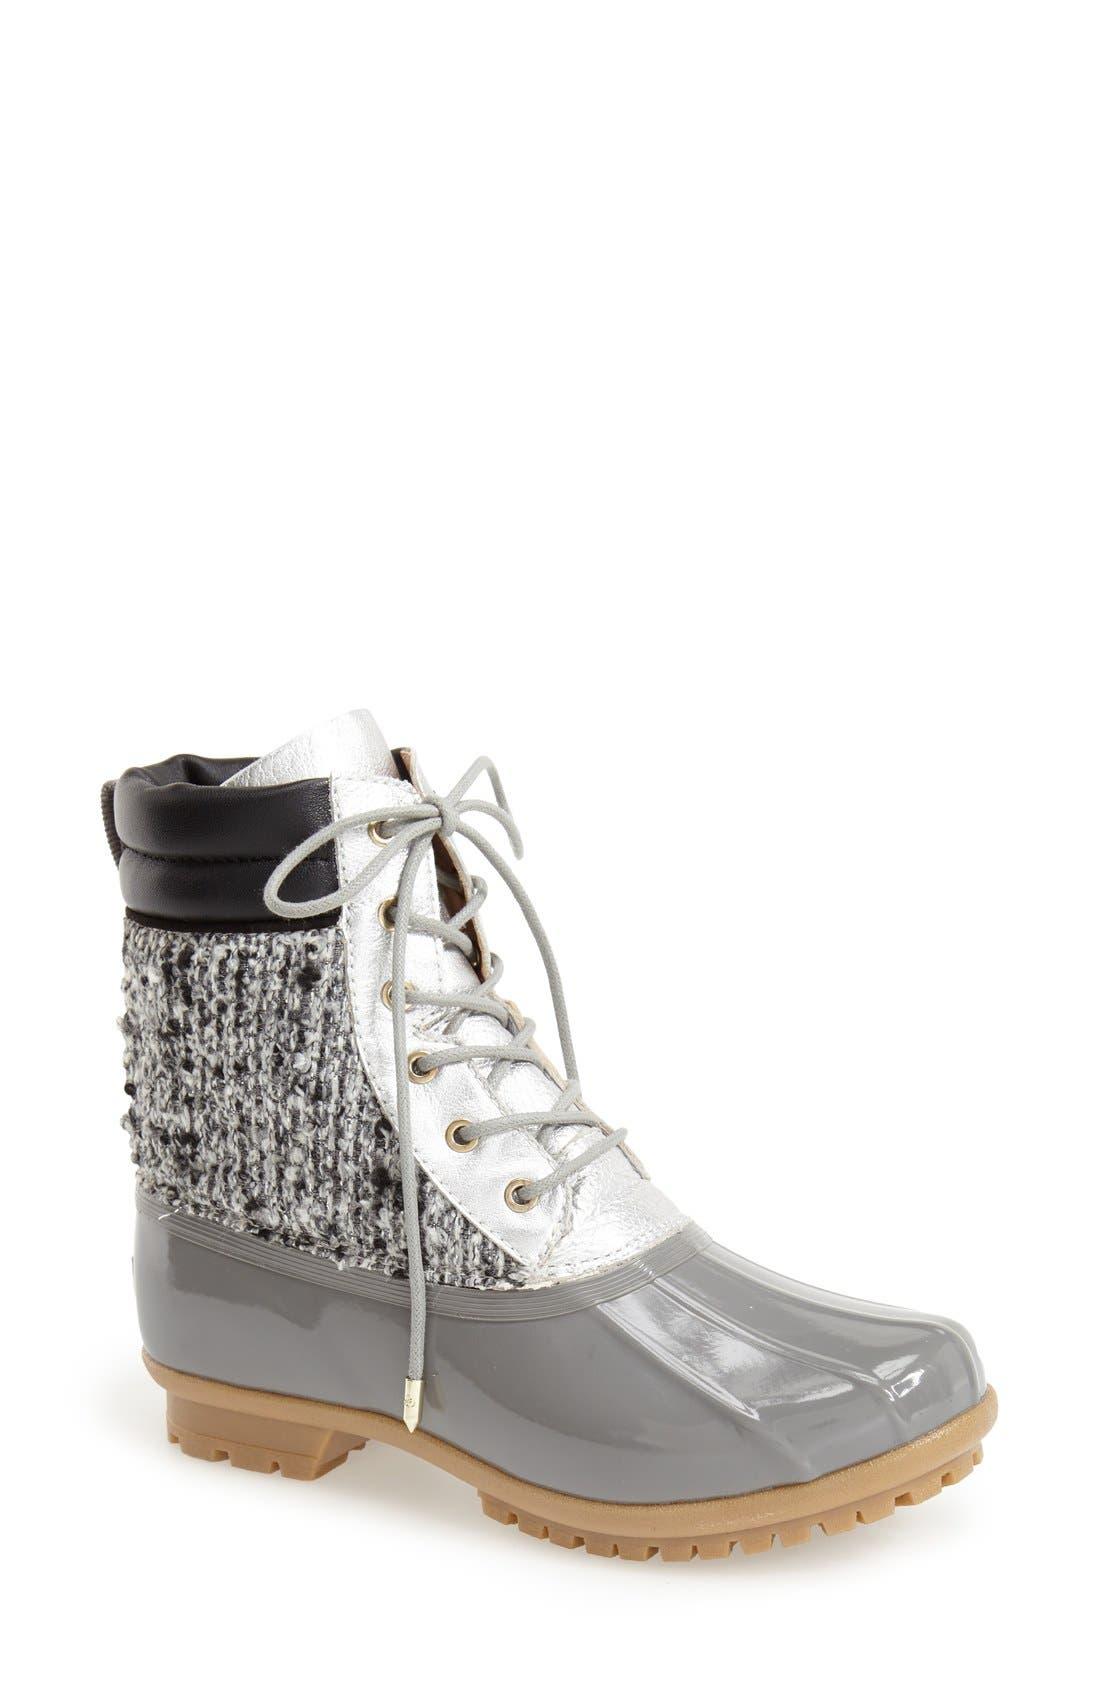 Alternate Image 1 Selected - Sam Edelman'Caldwell' Rain Boot (Women)